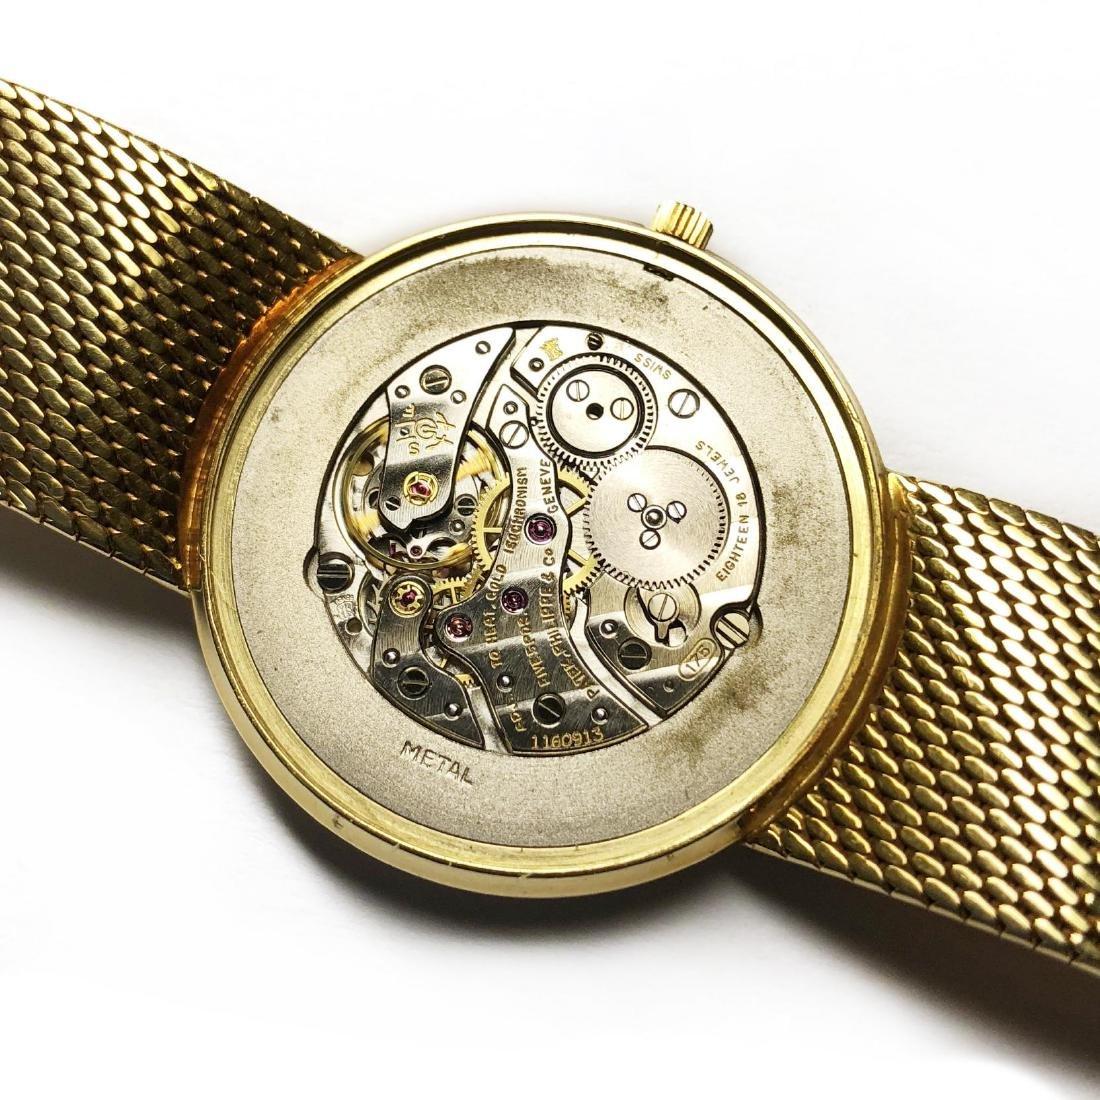 "Gent's 18KT Gold ""Calatrava"" Watch, Patek Philippe - 7"